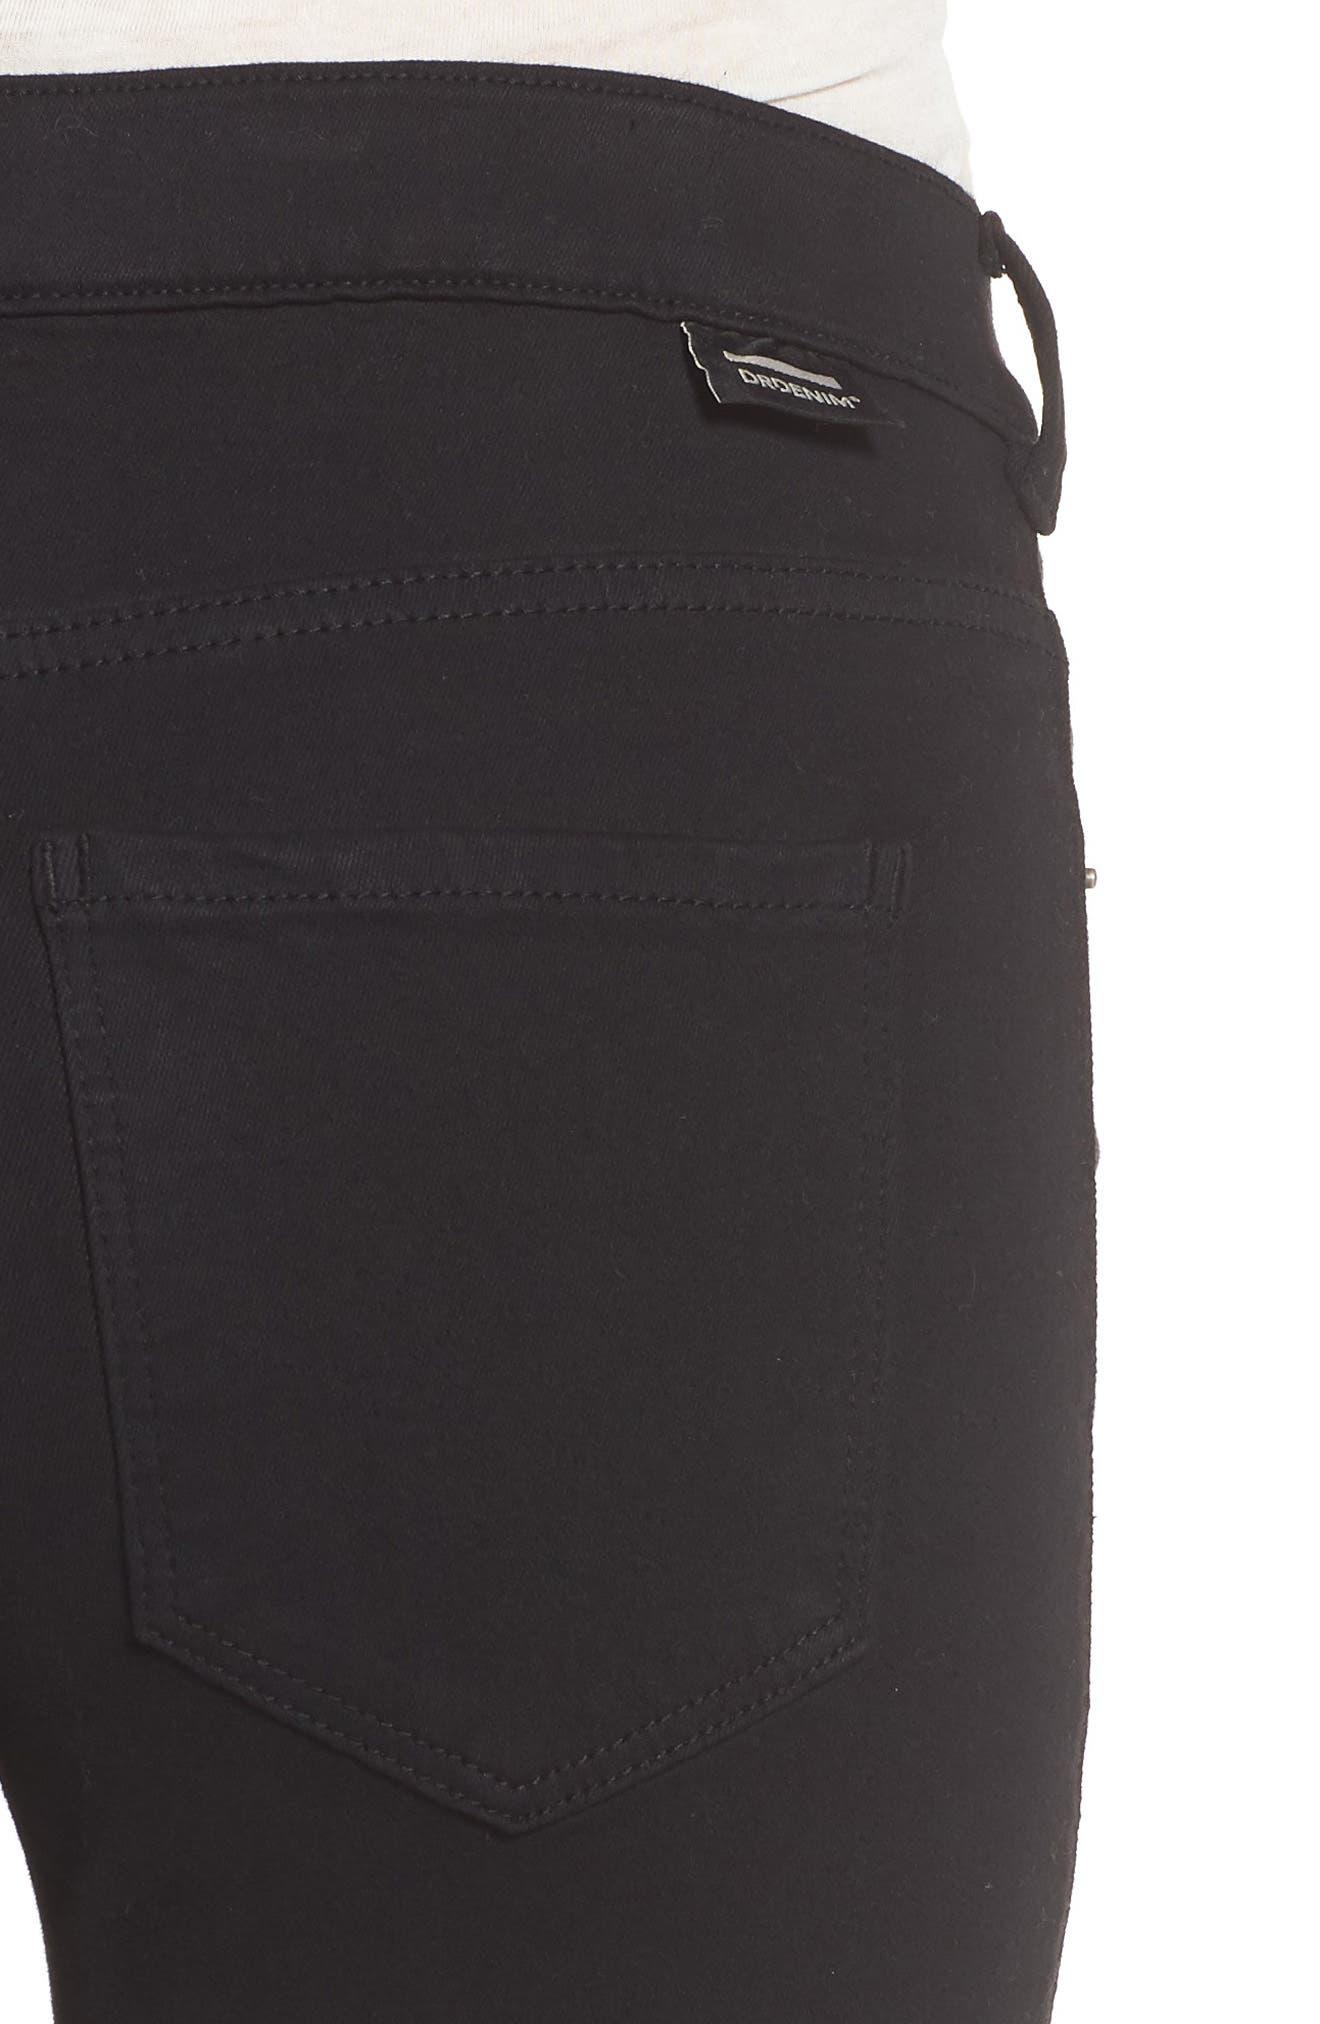 Lexy Skinny Jeans,                             Alternate thumbnail 4, color,                             Black